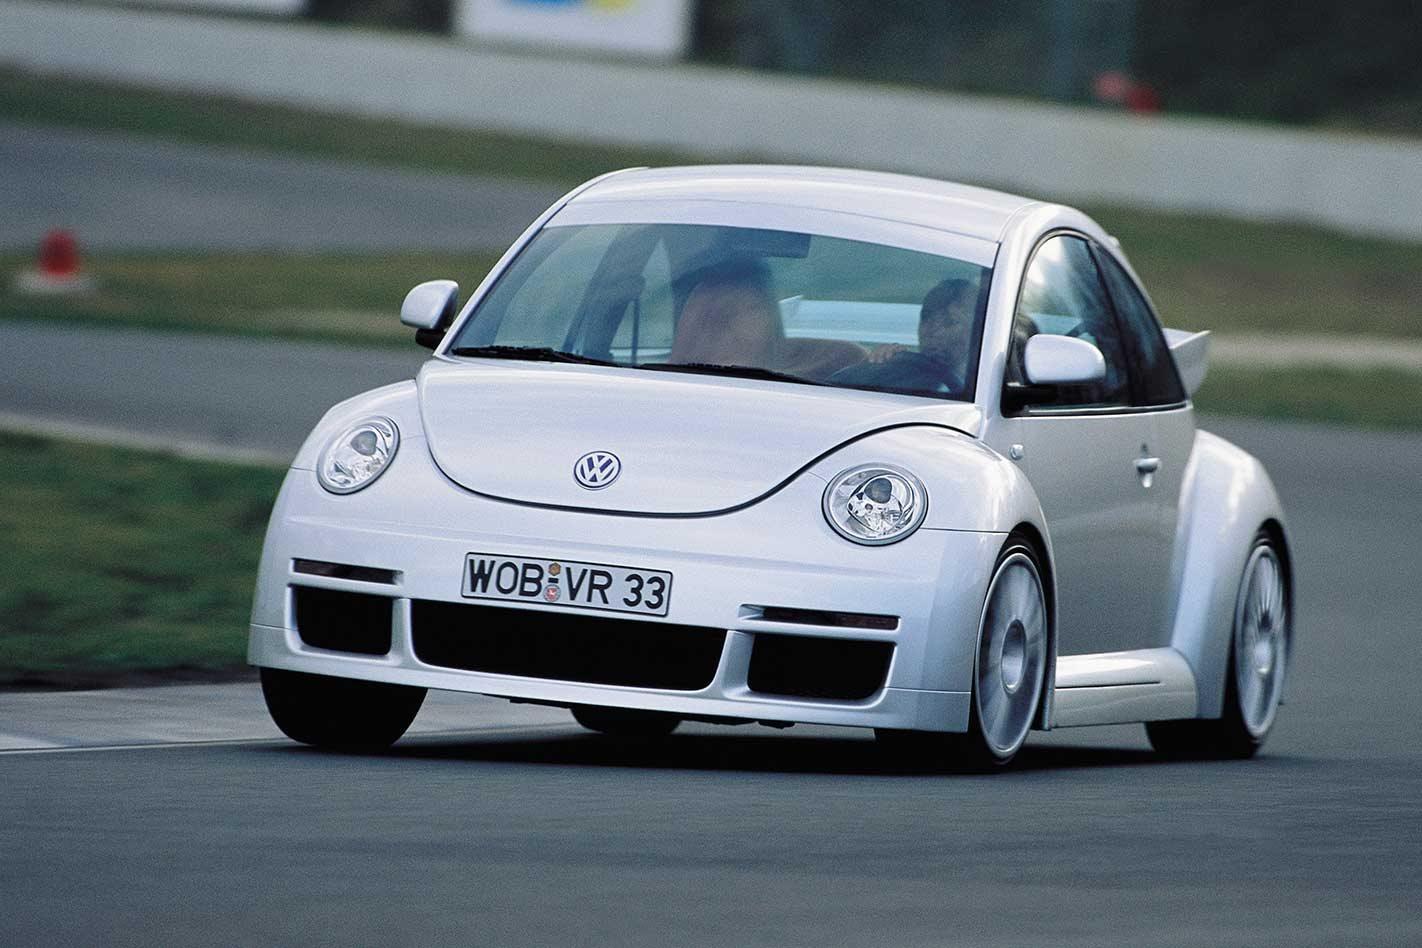 sivý volkswagen, súťaž, VW beetle 1, tuning, servis, autodielňa, preteky, rýchla jazda